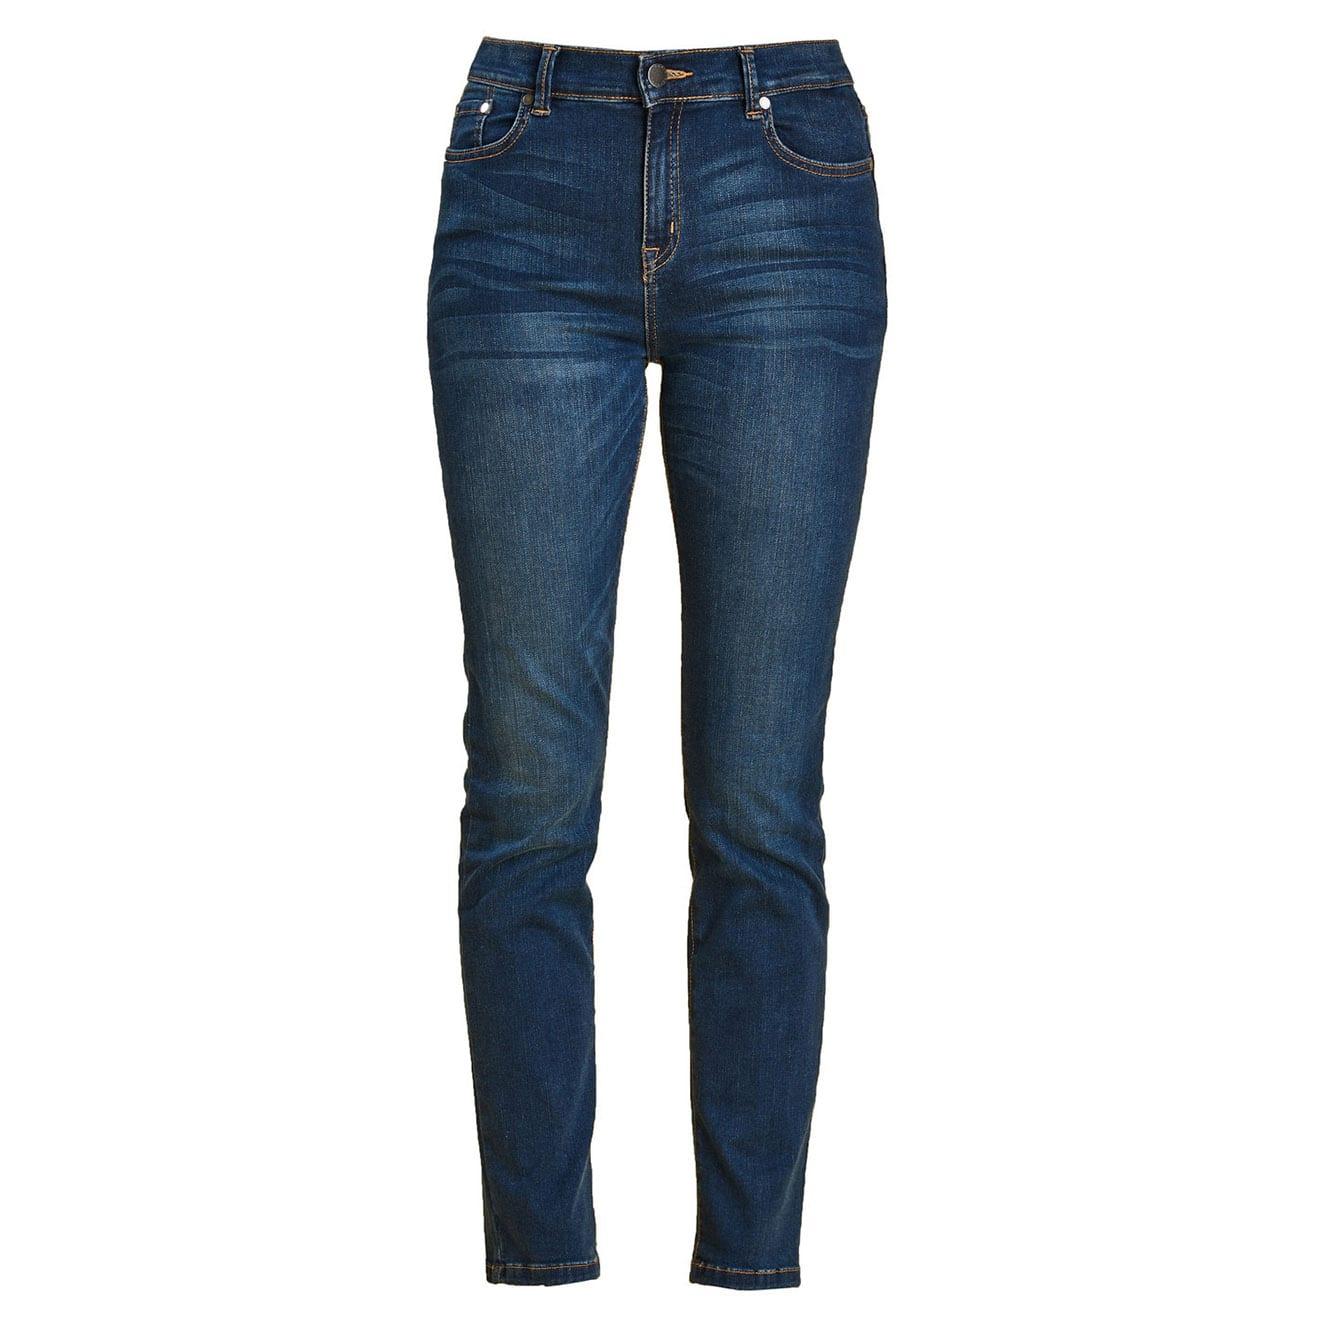 Barbour Womens Slim Fit Jeans Worn Blue